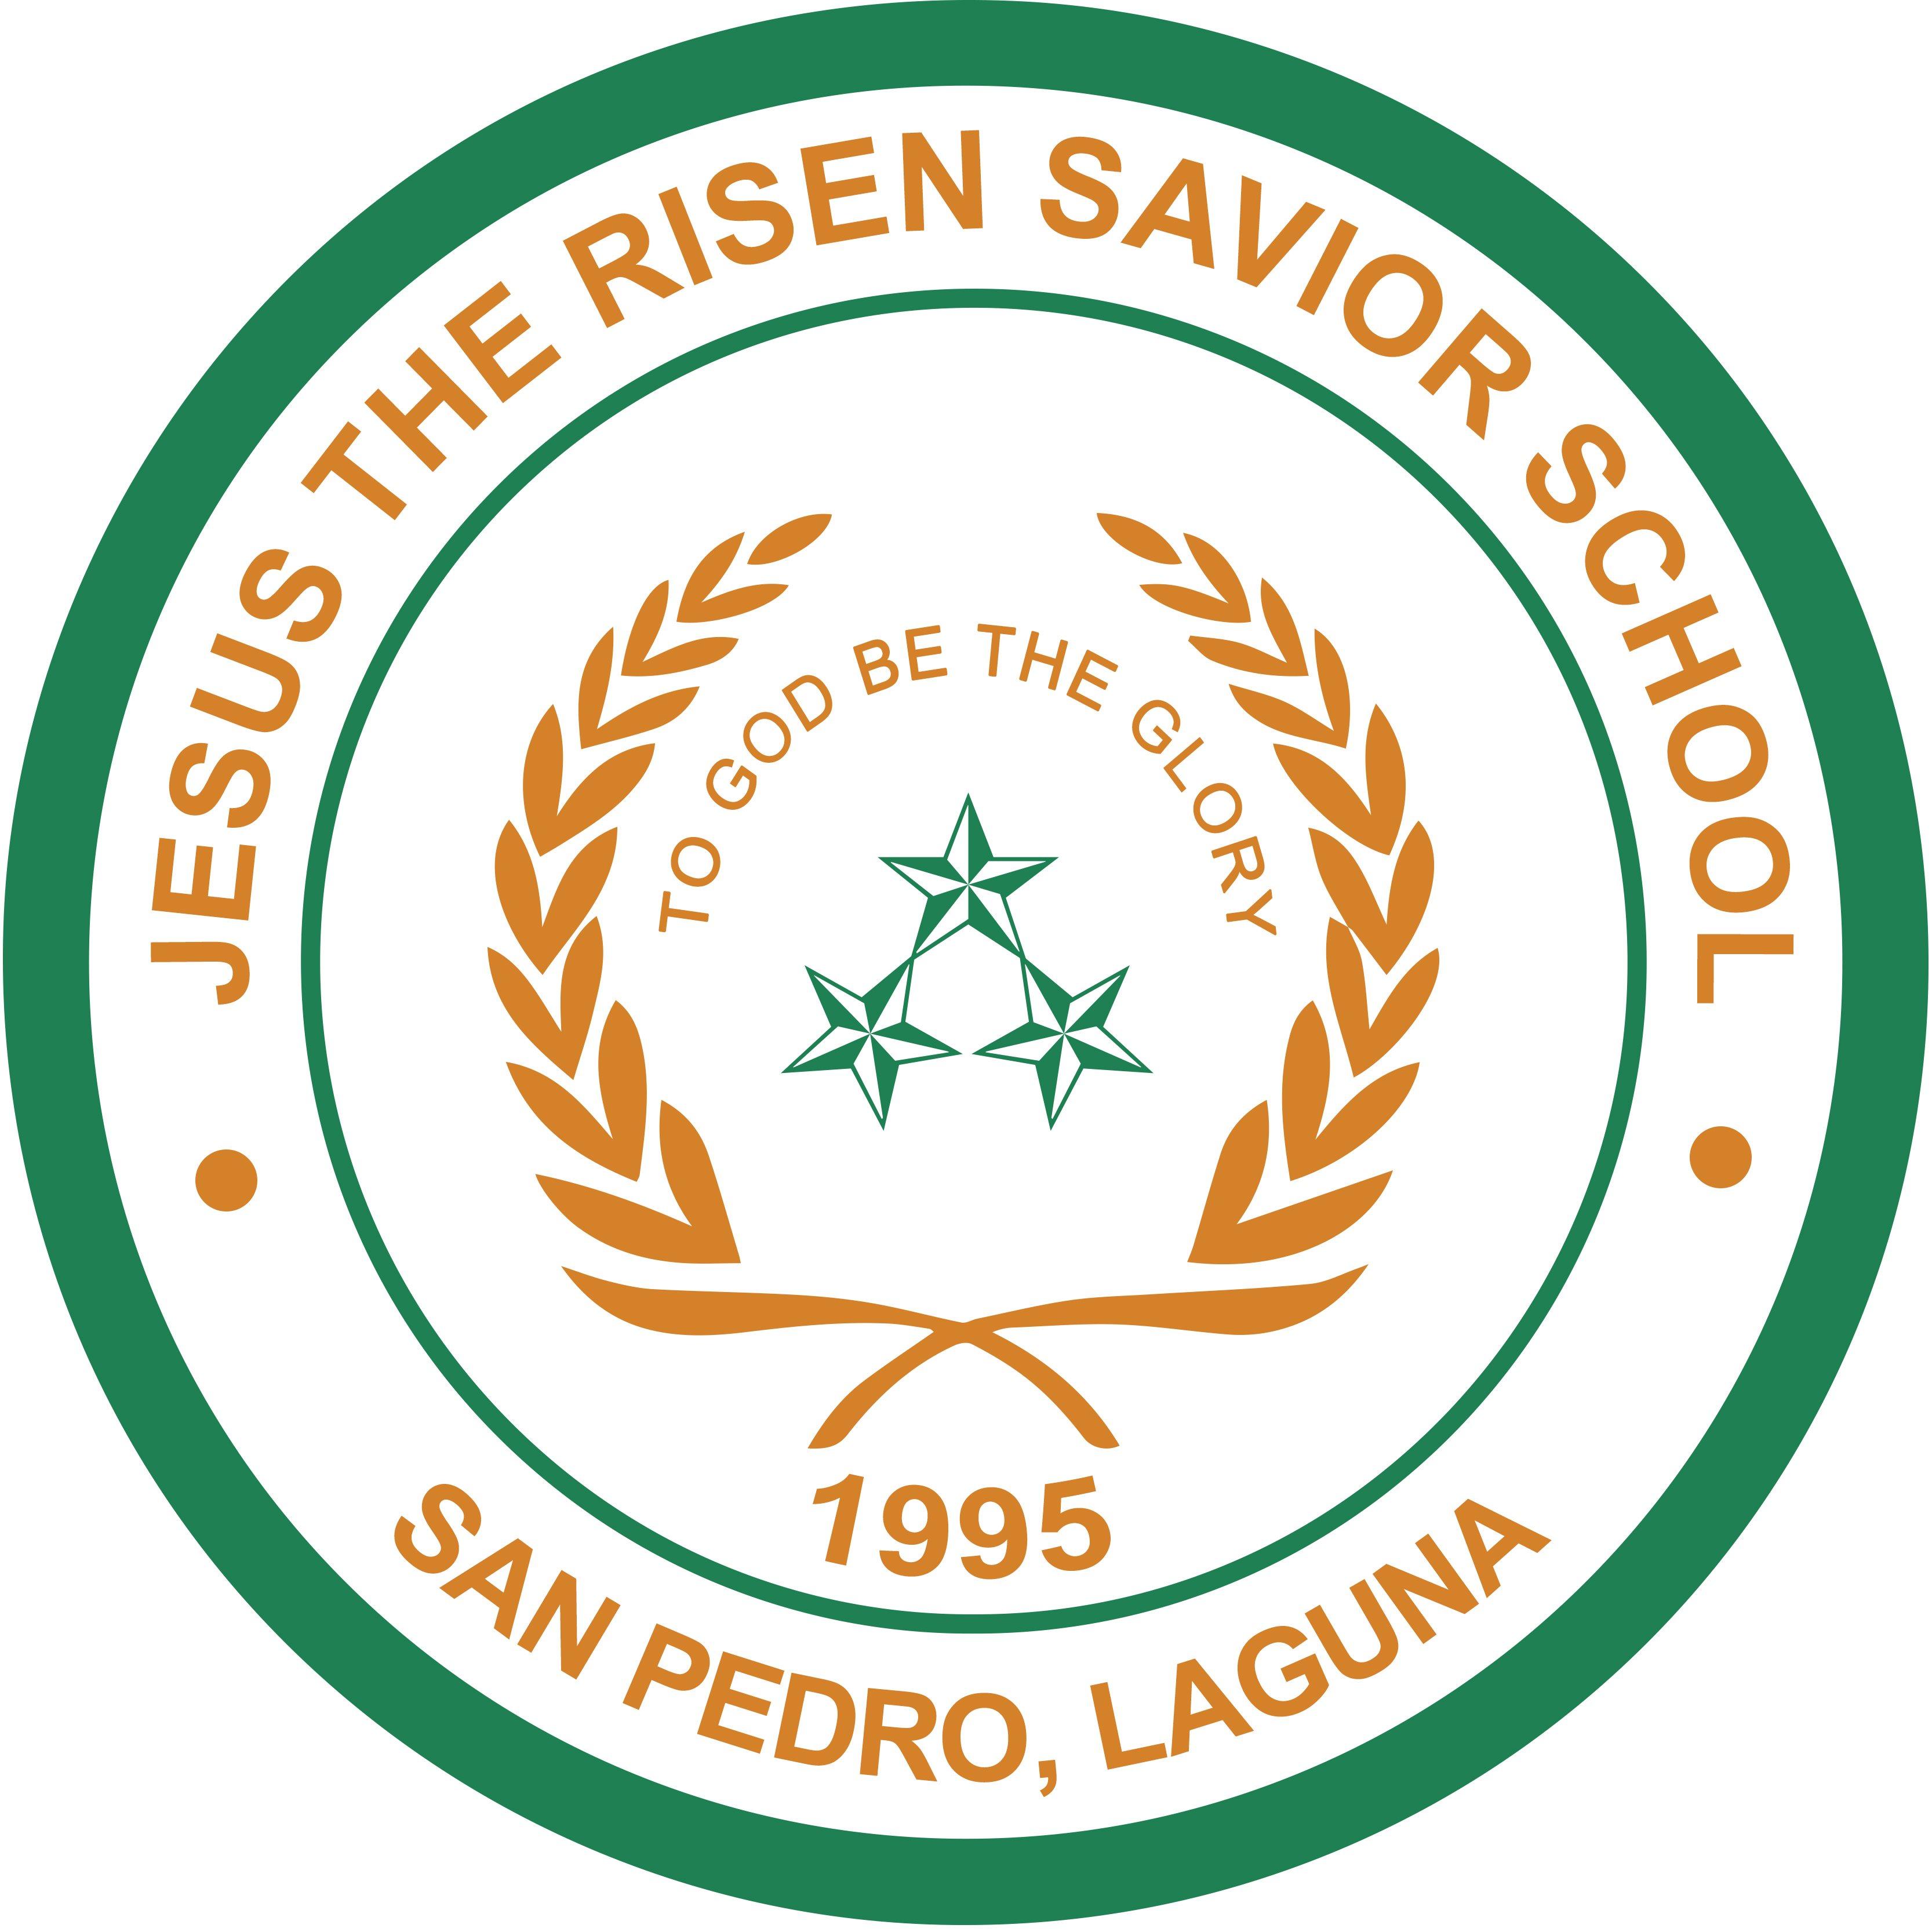 Jesus the Risen Savior School - De La Salle Accredited